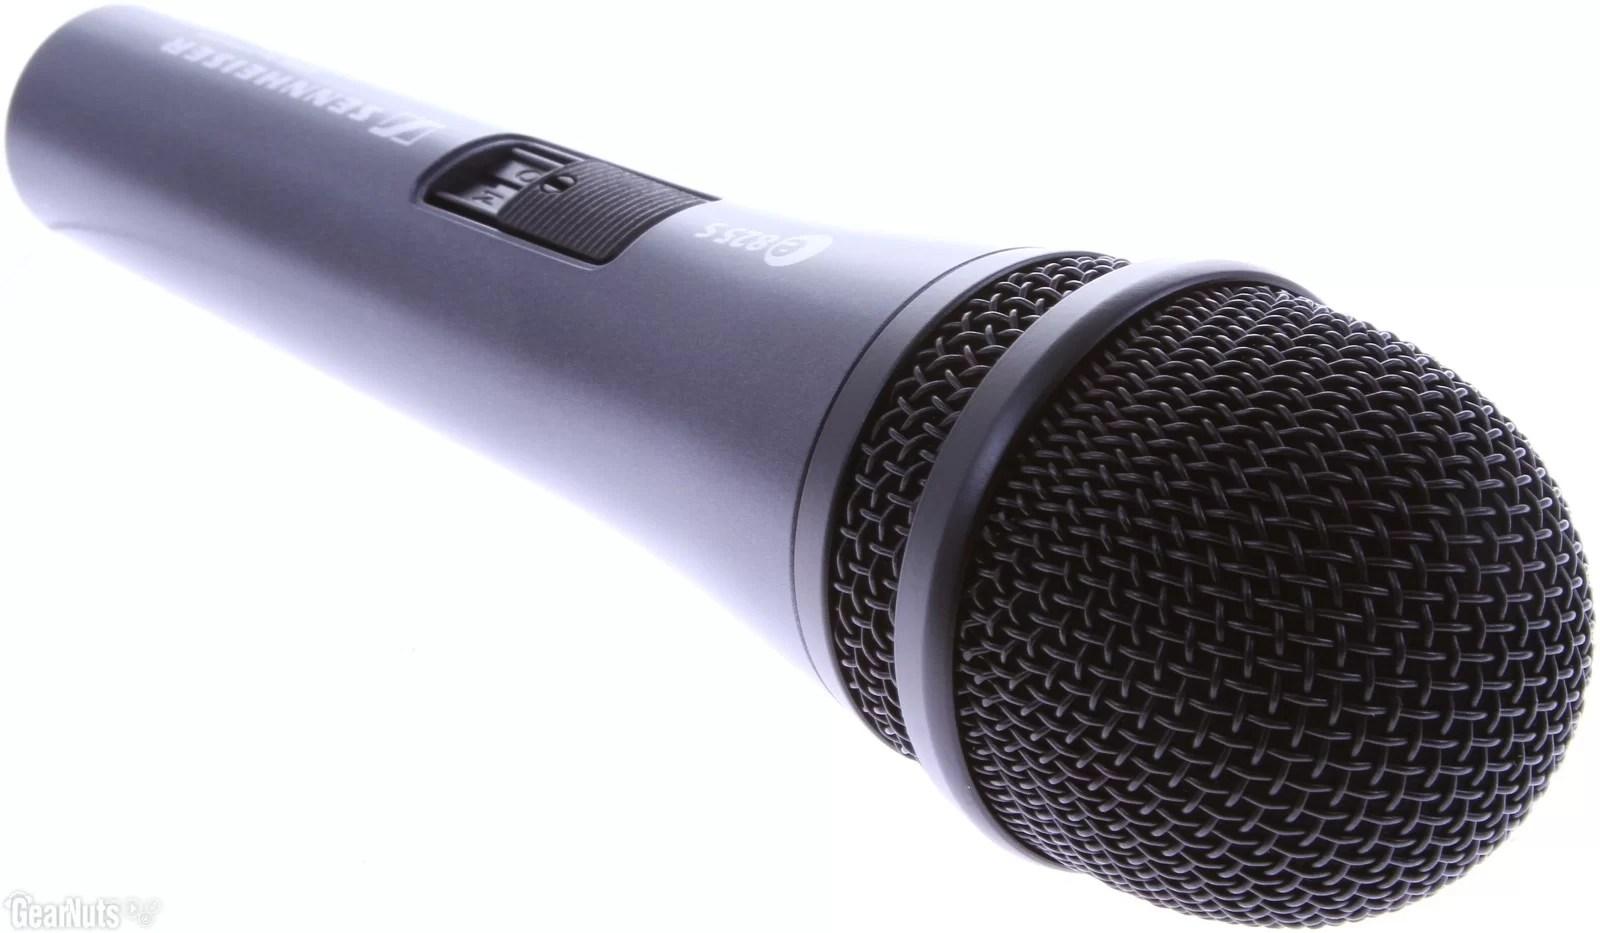 Dynamic Vocal Microphone E825s : sennheiser e825s handheld dynamic vocal microphone hashmi photos ~ Hamham.info Haus und Dekorationen